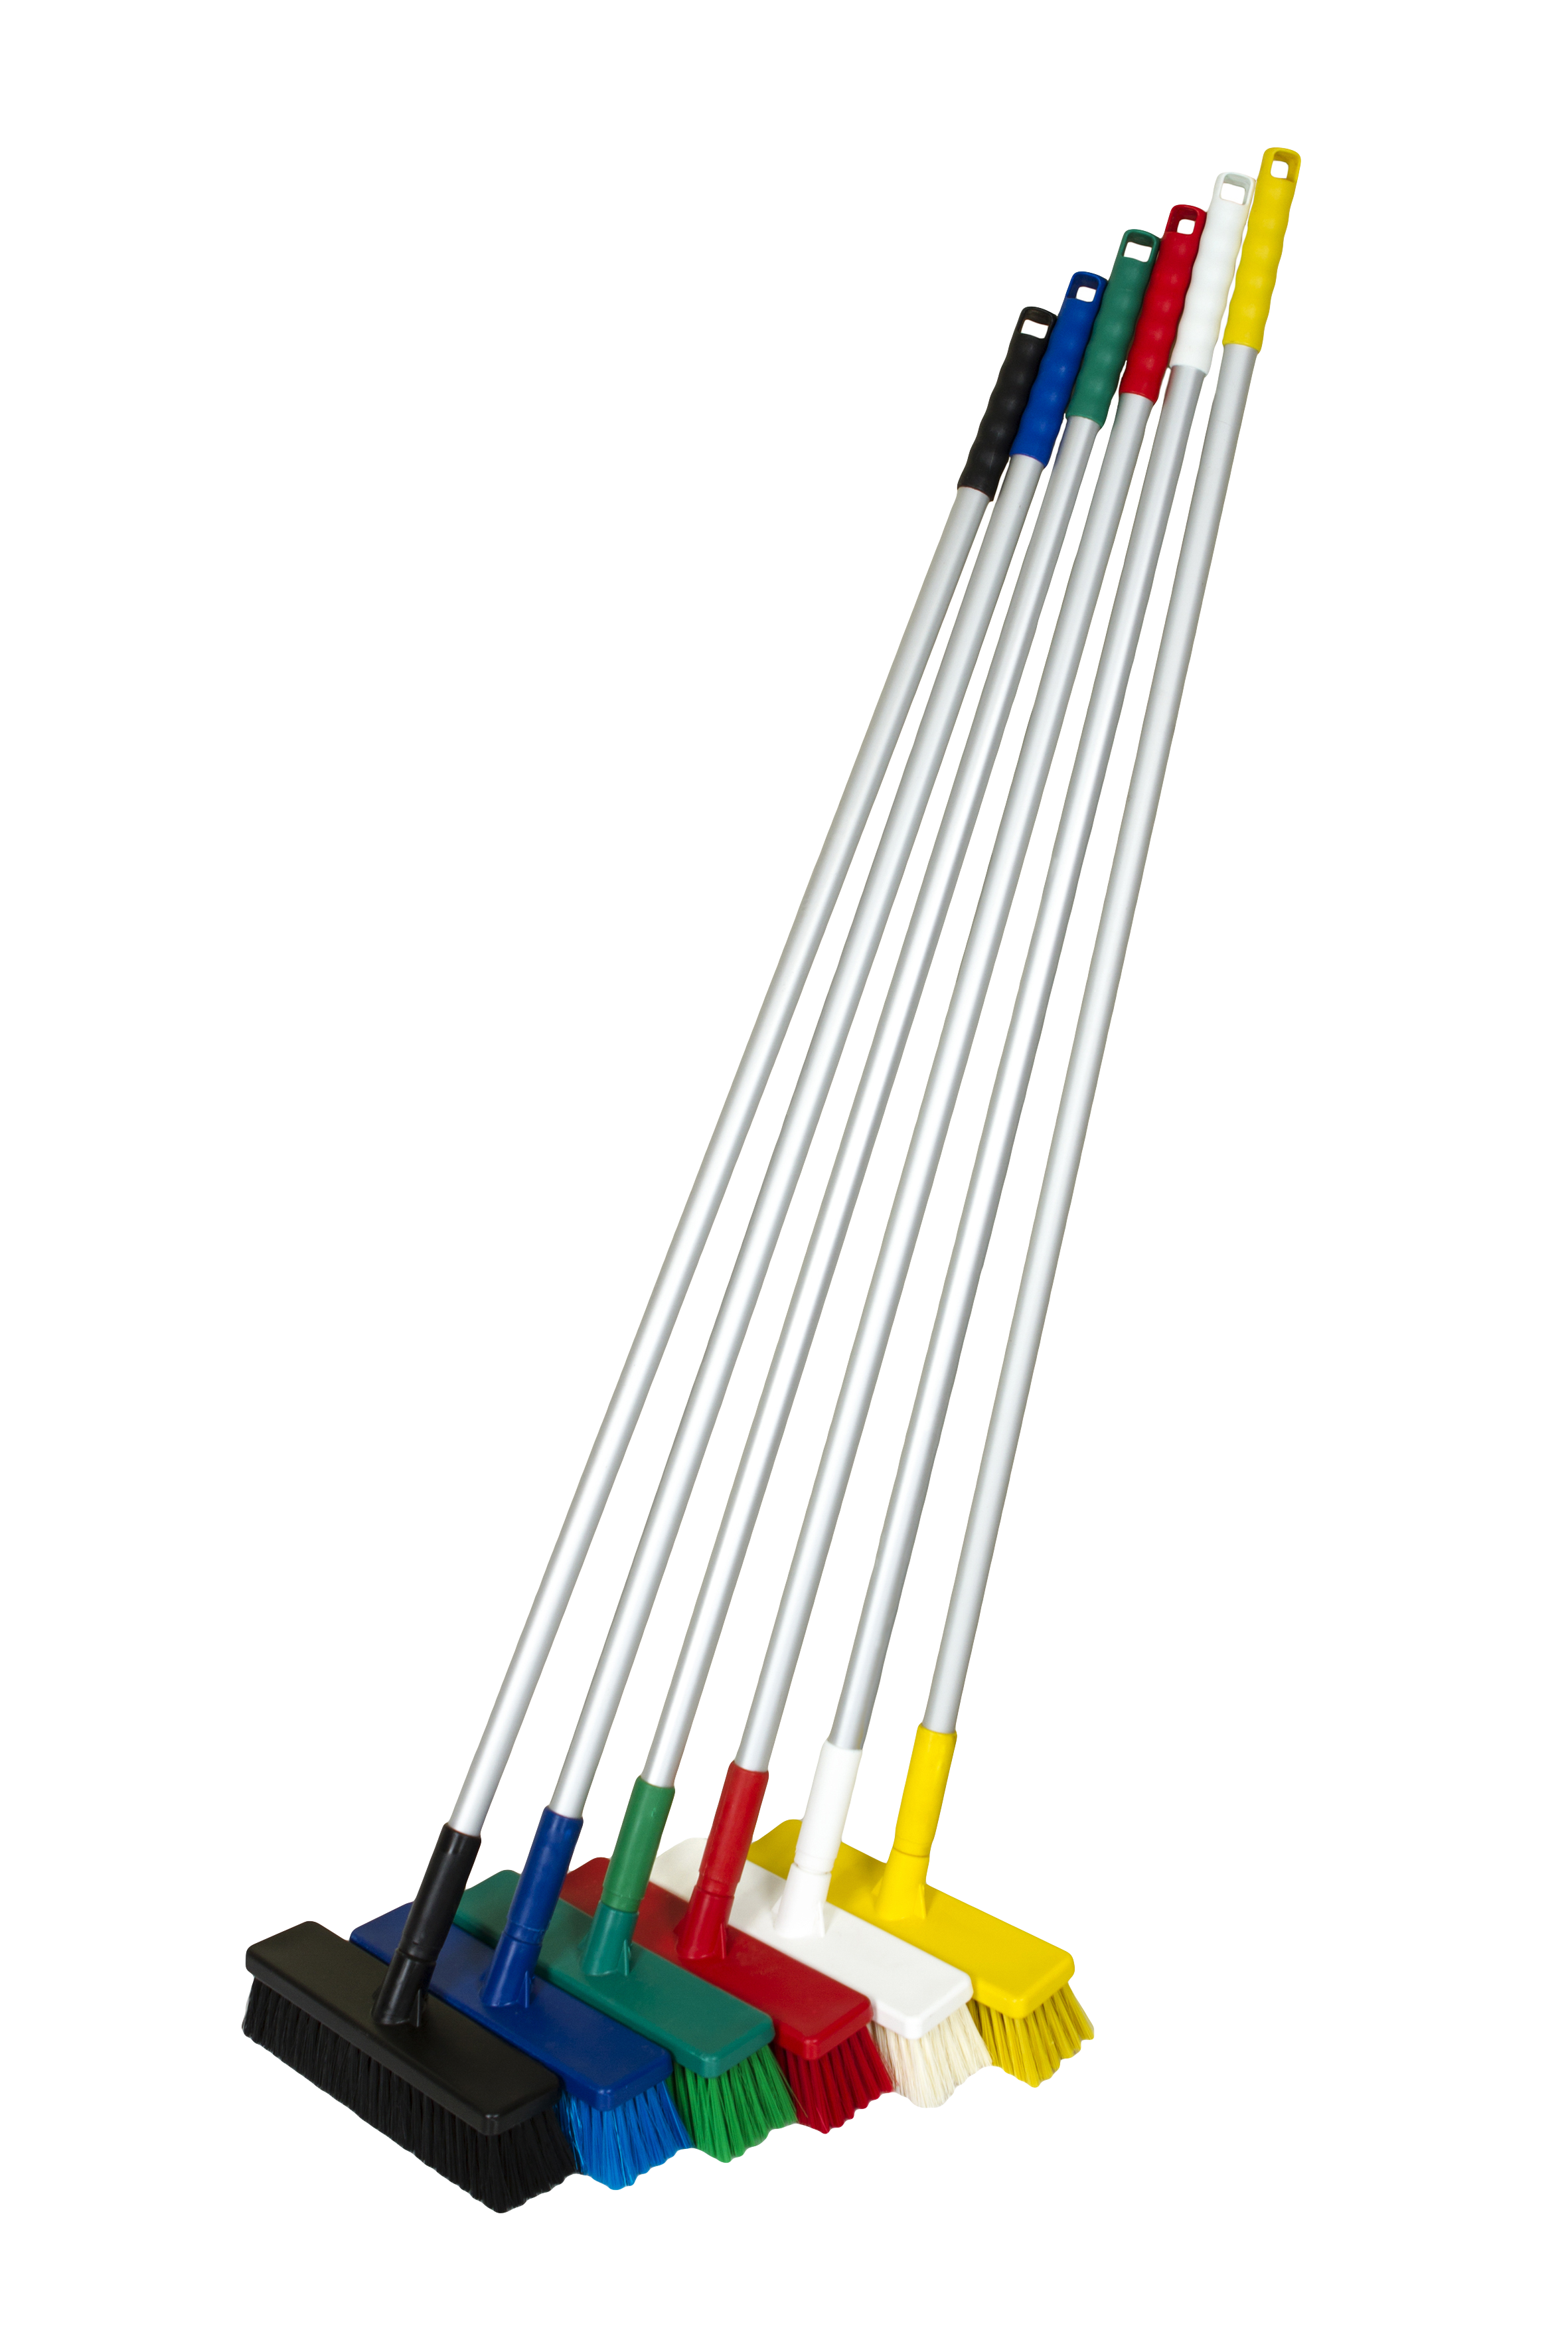 Hectoserve Hygiene Brooms